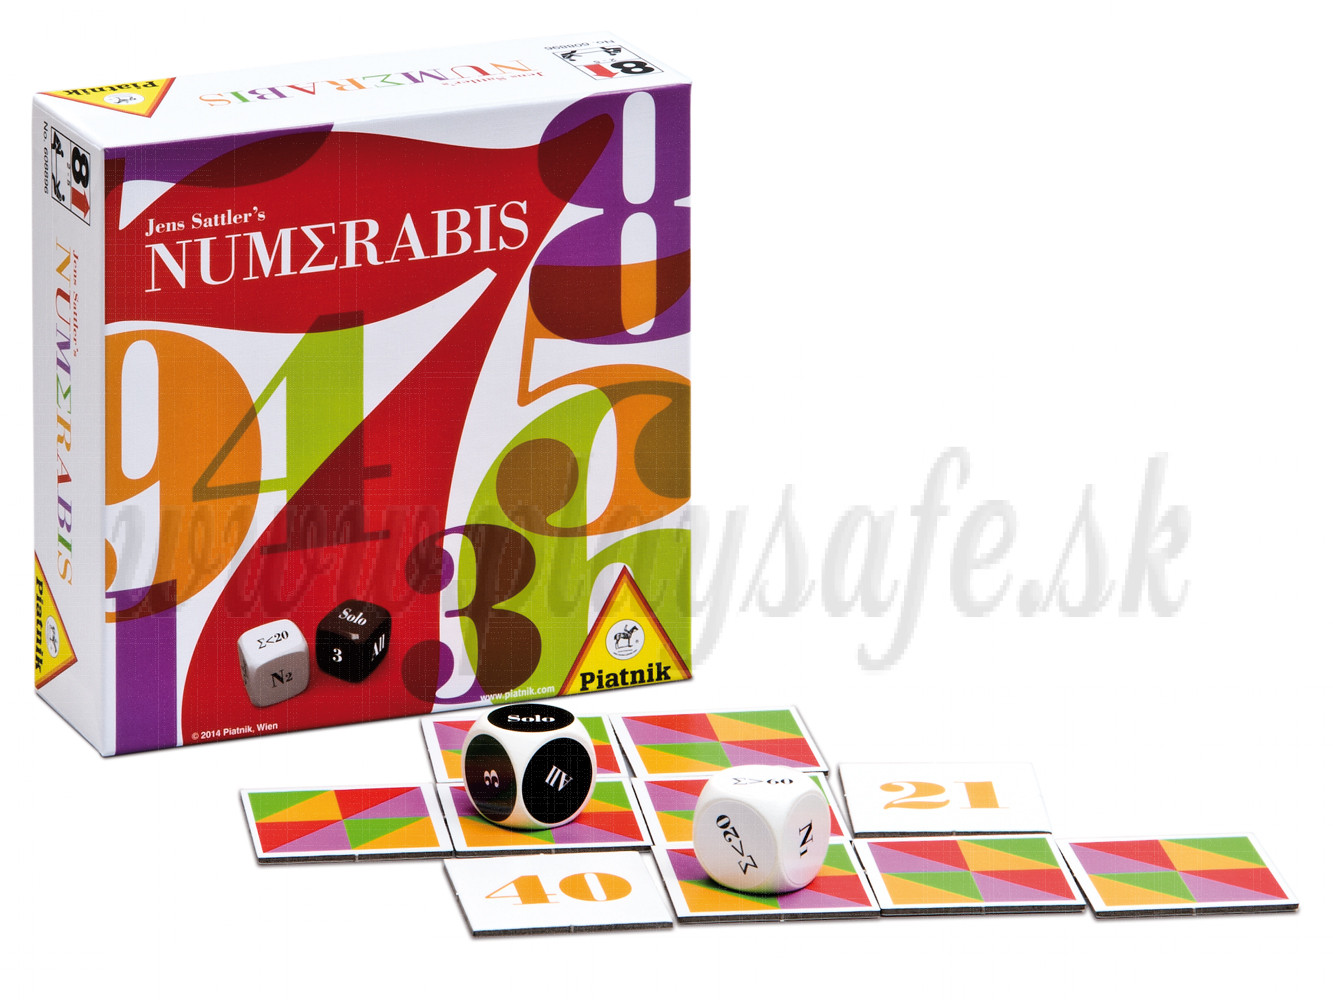 Piatnik Spoločenská matematická hra Numerabis